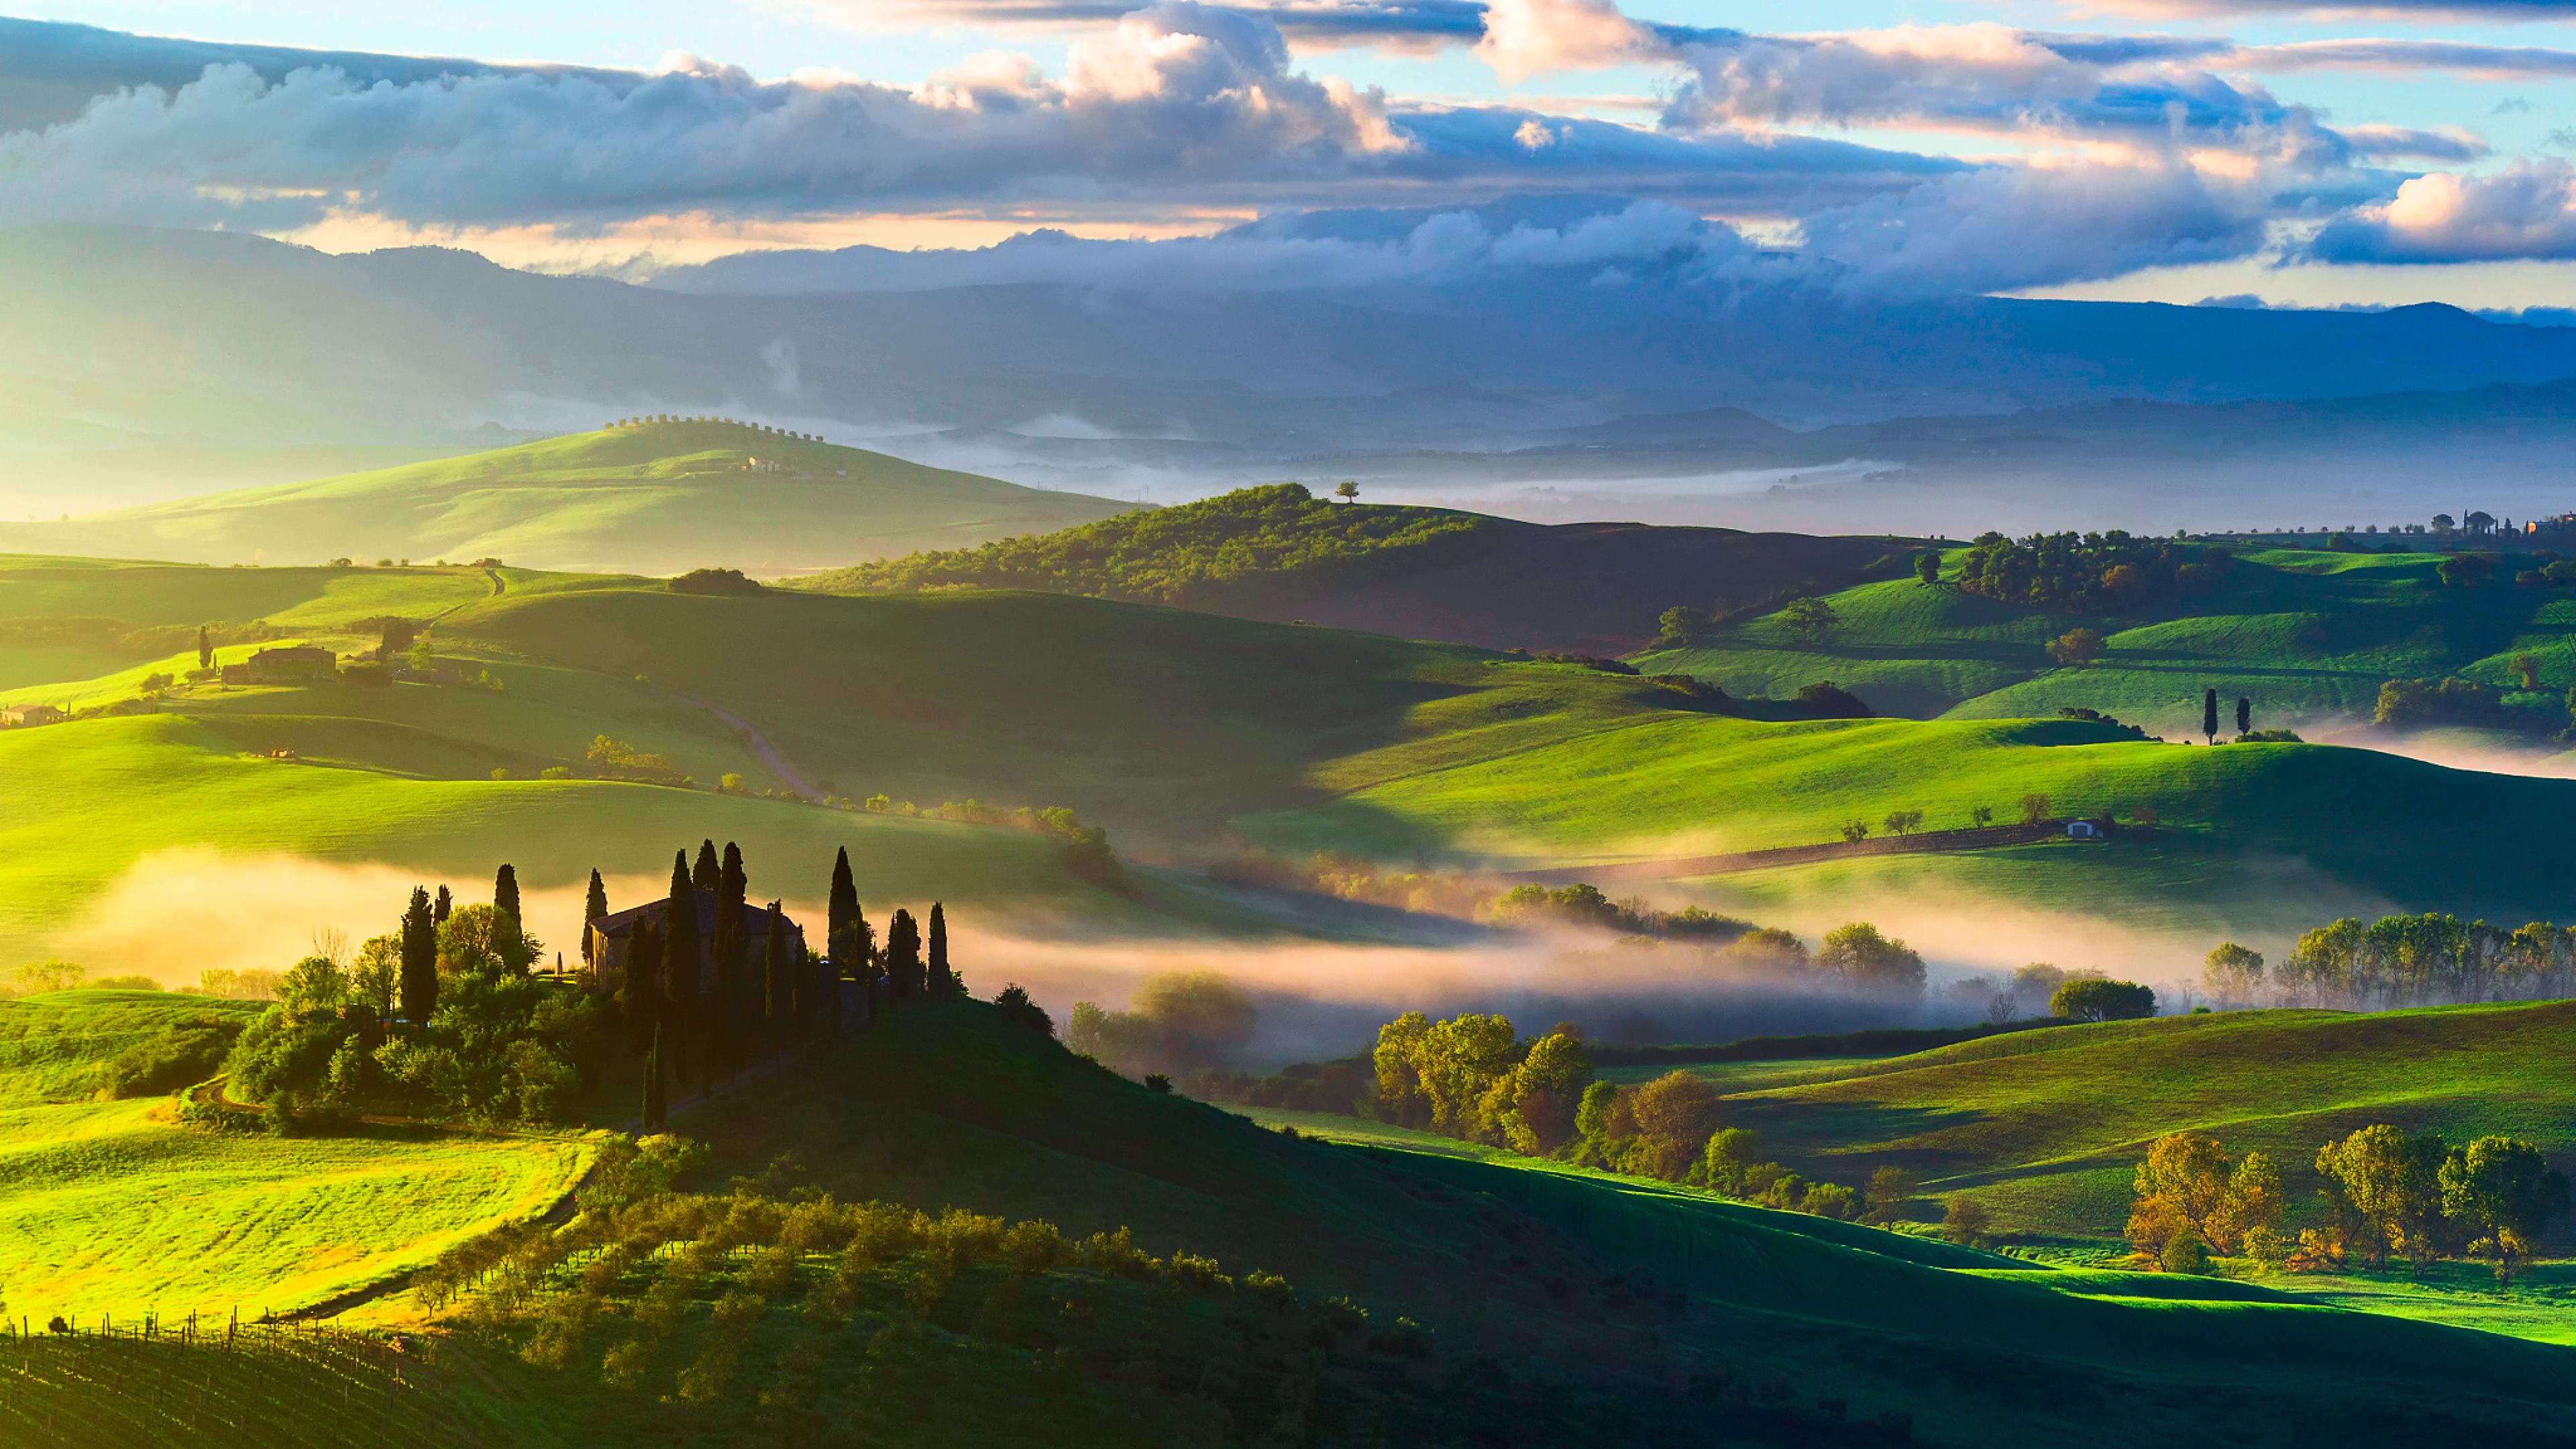 3840x2160 italy, tuscany, fields 4K Wallpaper, HD Nature ...